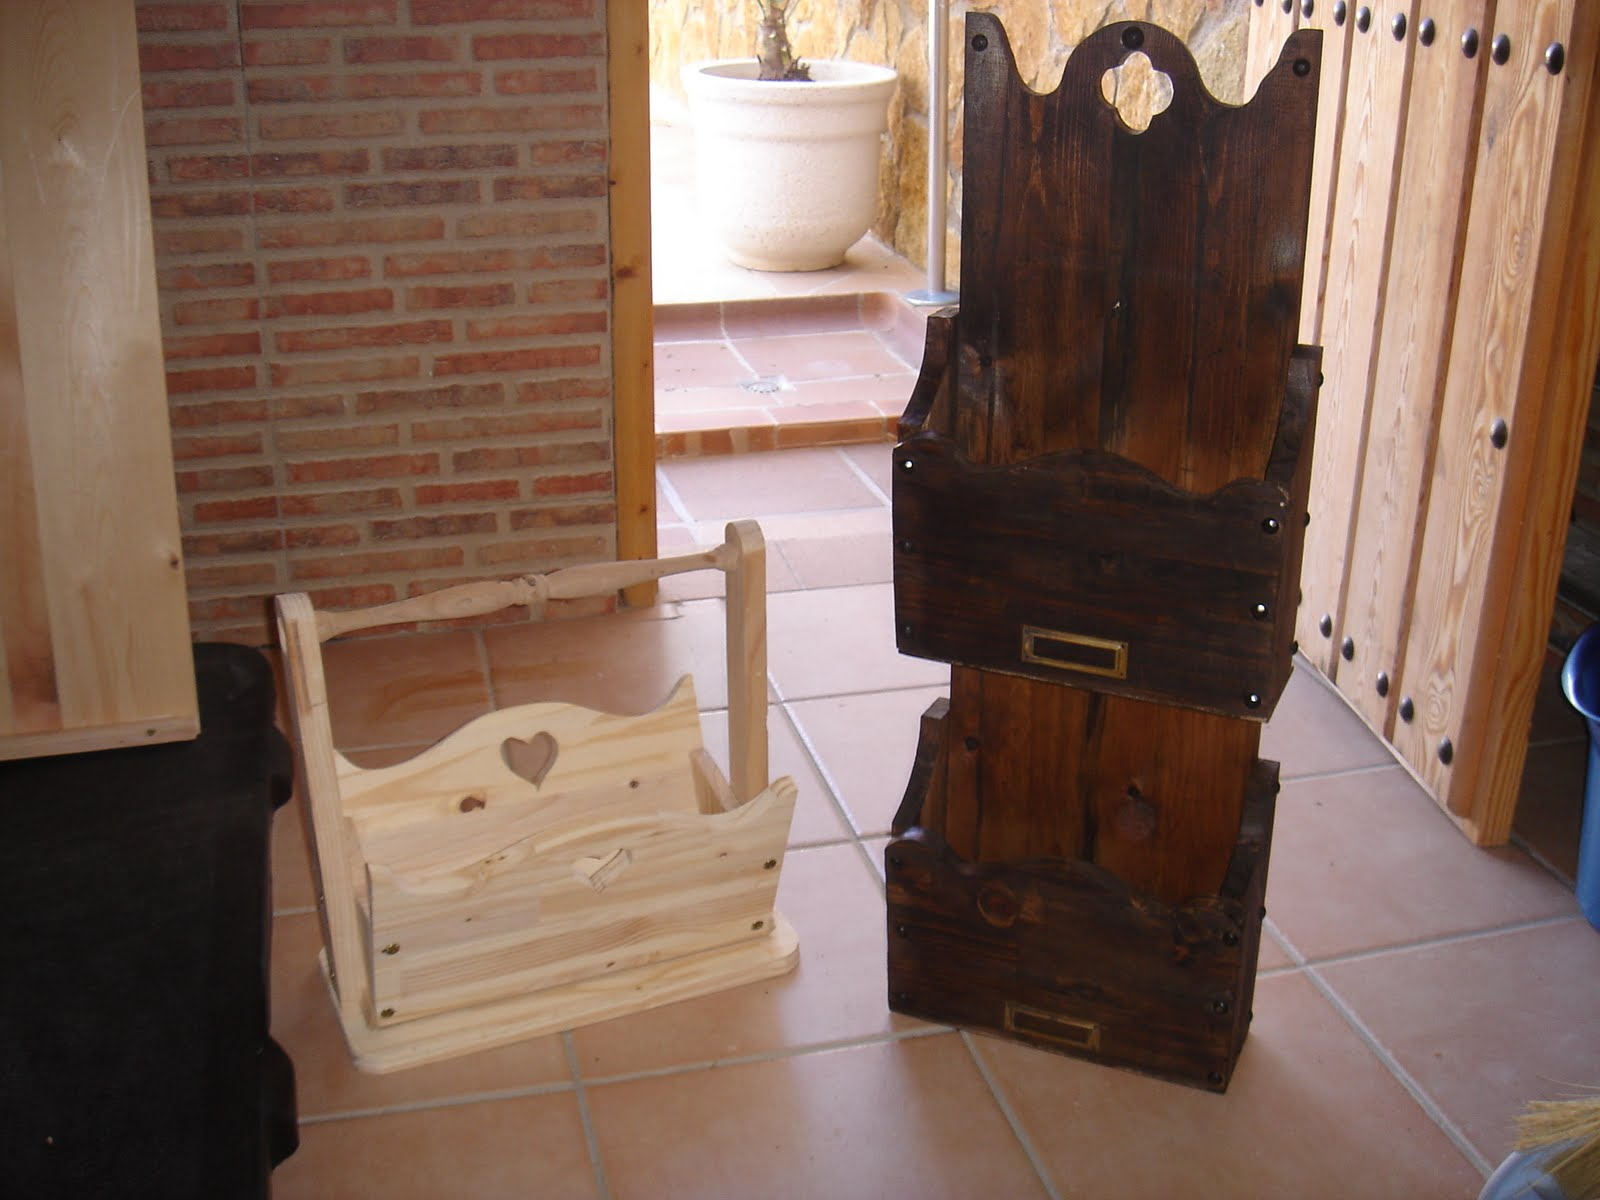 El rinc n del artesano revisteros - Revisteros de pared ...